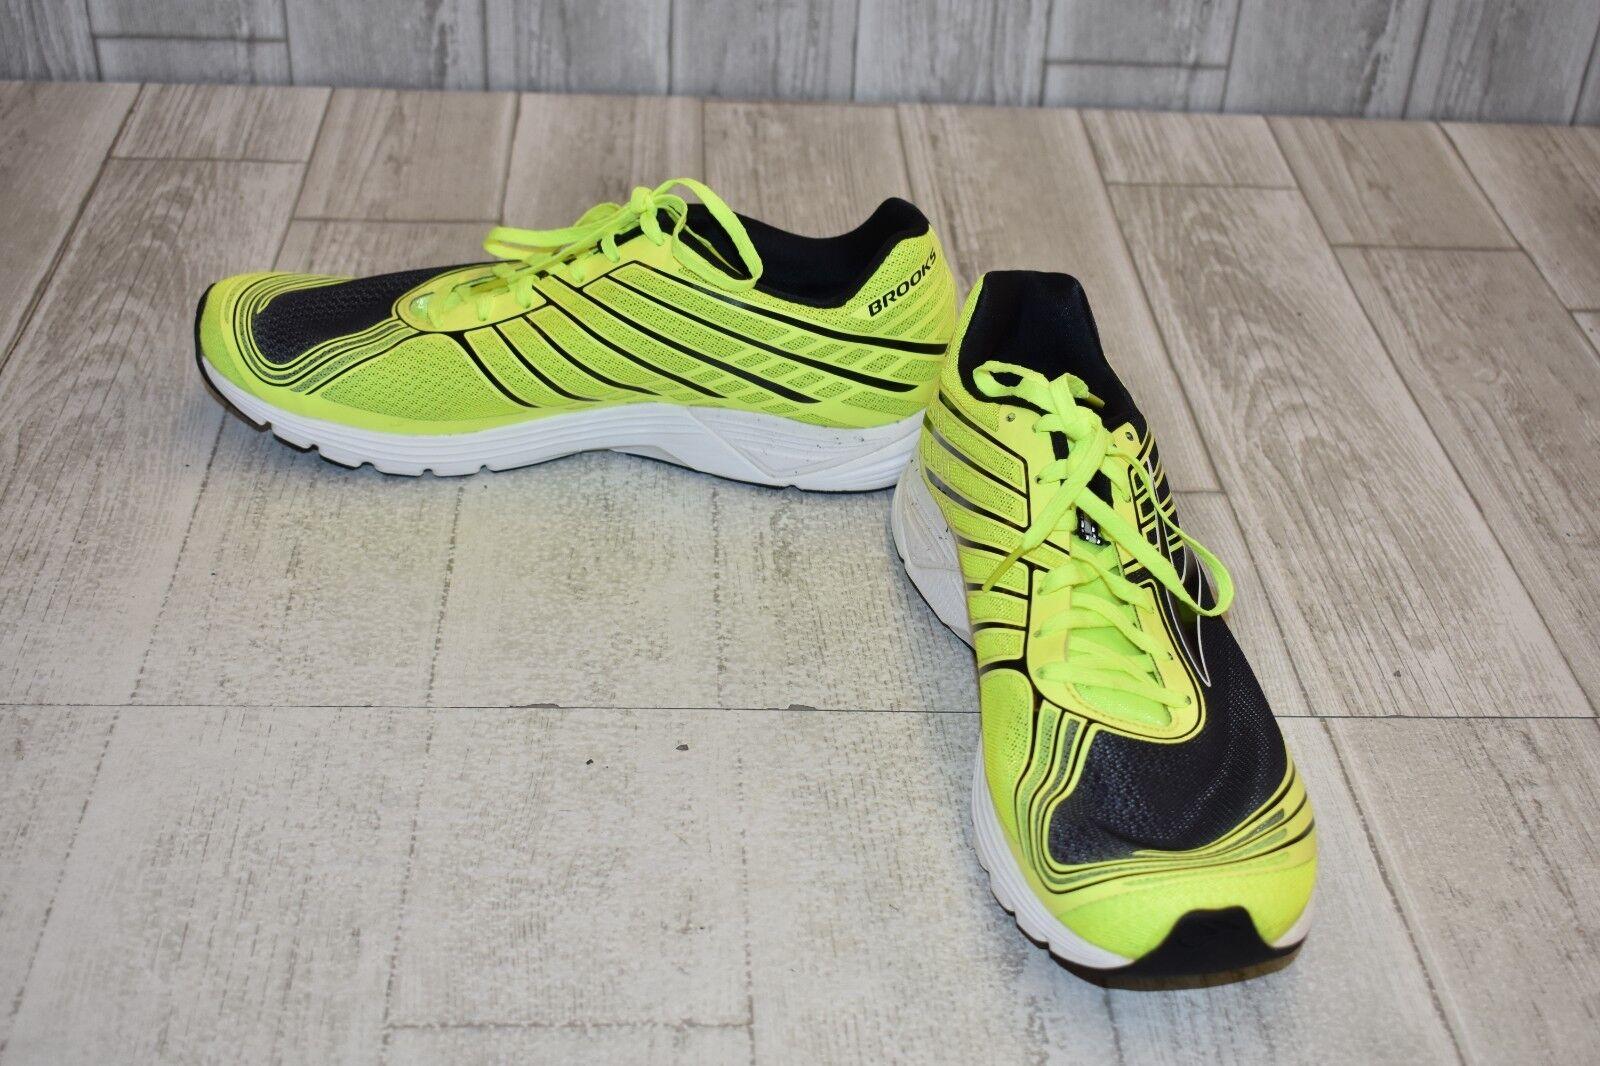 Brooks Asteria Running scarpe, Uomo Dimensione 11.5 D, nero nero nero Nightlife 00b0fe